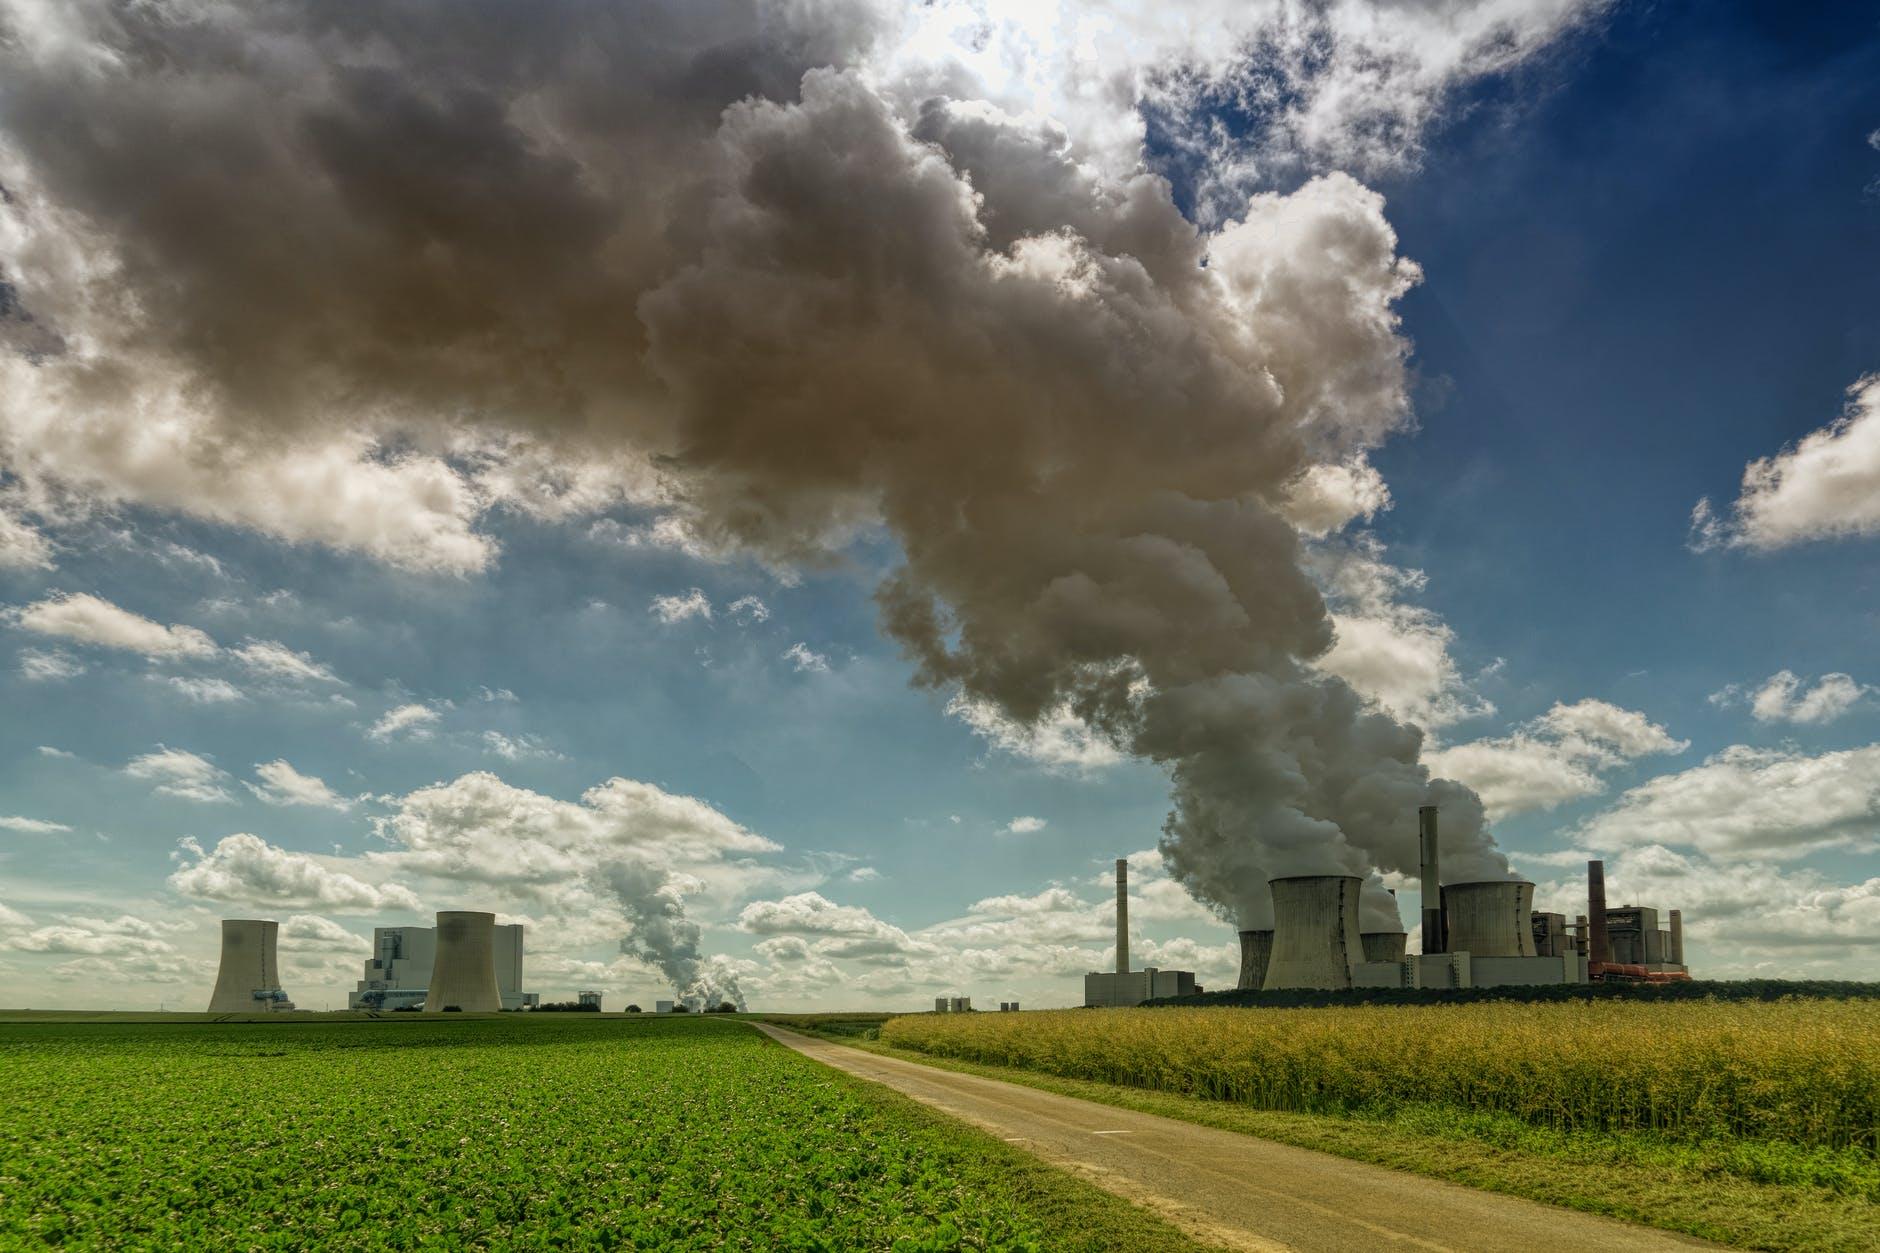 industrial machine near crops